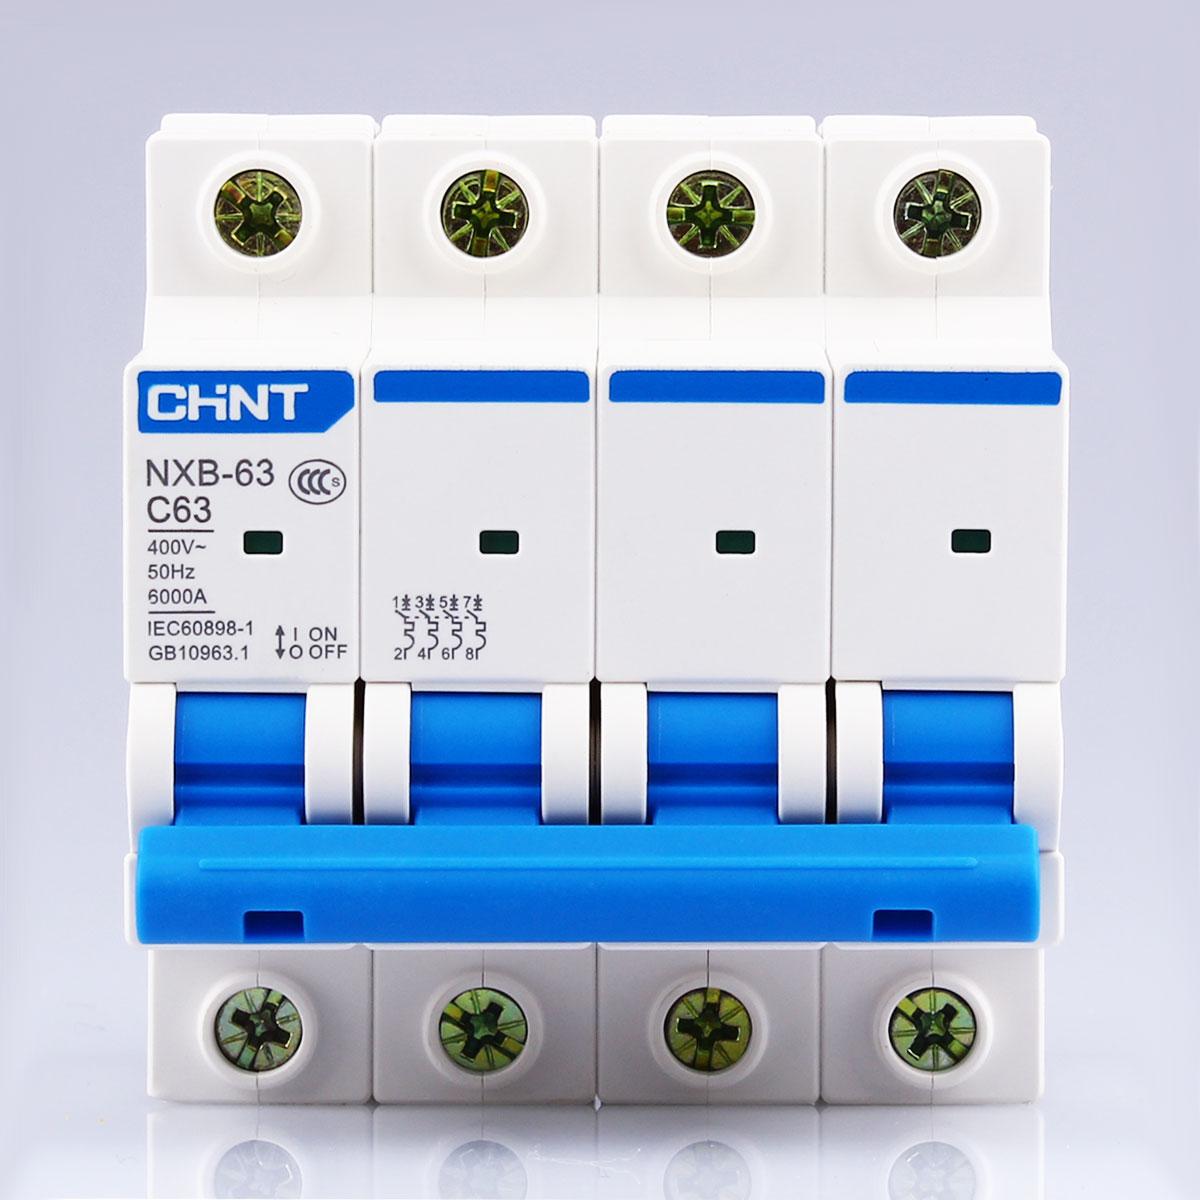 CHNT CHINT NXB-63 4P 1A 2A 3A 6A 10A 16A 20A 25A 32A 40A 63A 230V 380V Miniature Circuit breaker MCB NEW DZ47 idpna vigi dpnl rcbo 6a 32a 25a 20a 16a 10a 18mm 230v 30ma residual current circuit breaker leakage protection mcb a9d91620